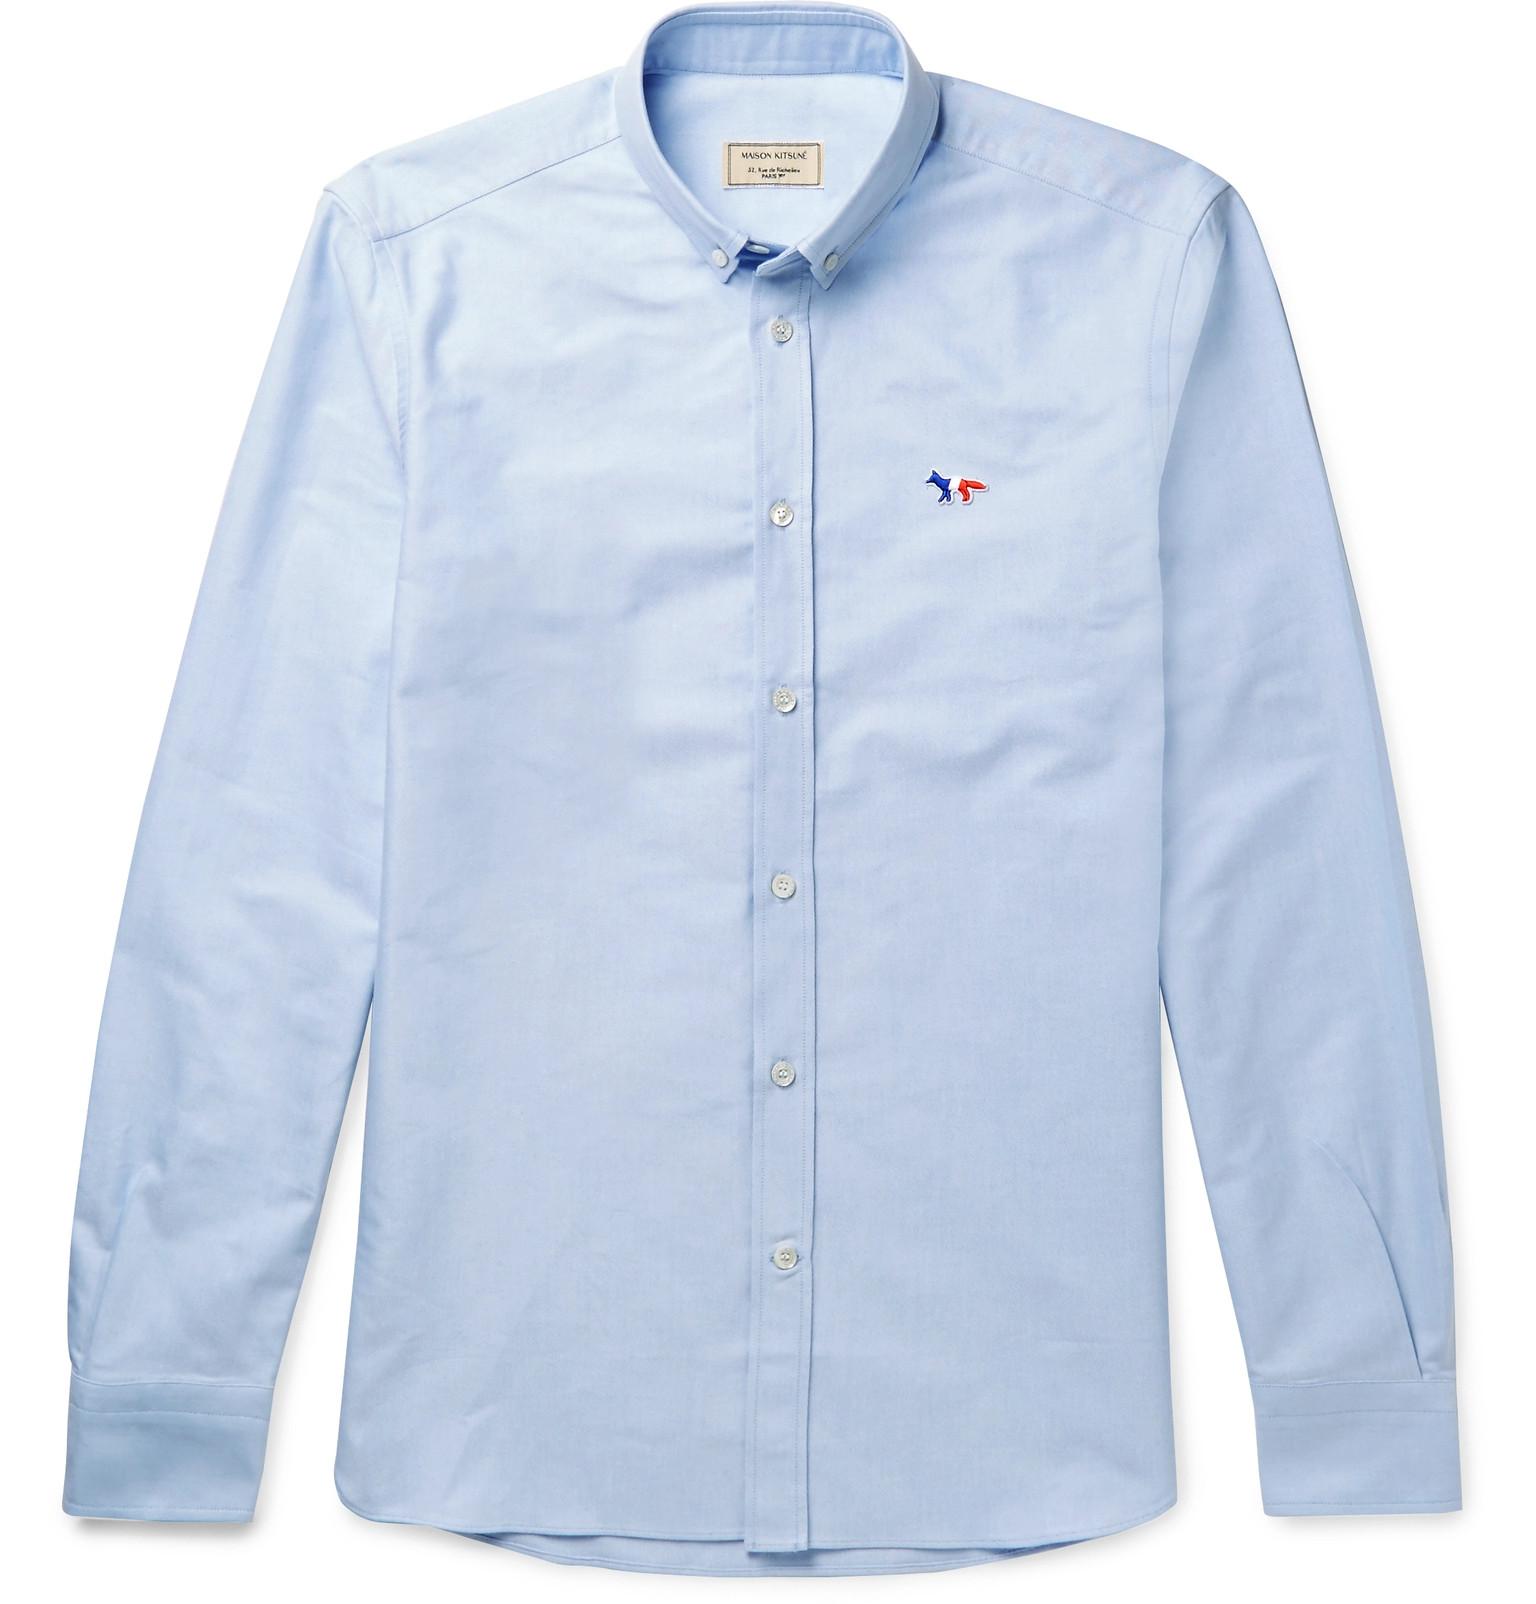 Maison Kitsuné Slim-Fit Button-Down Collar Cotton Oxford Shirt